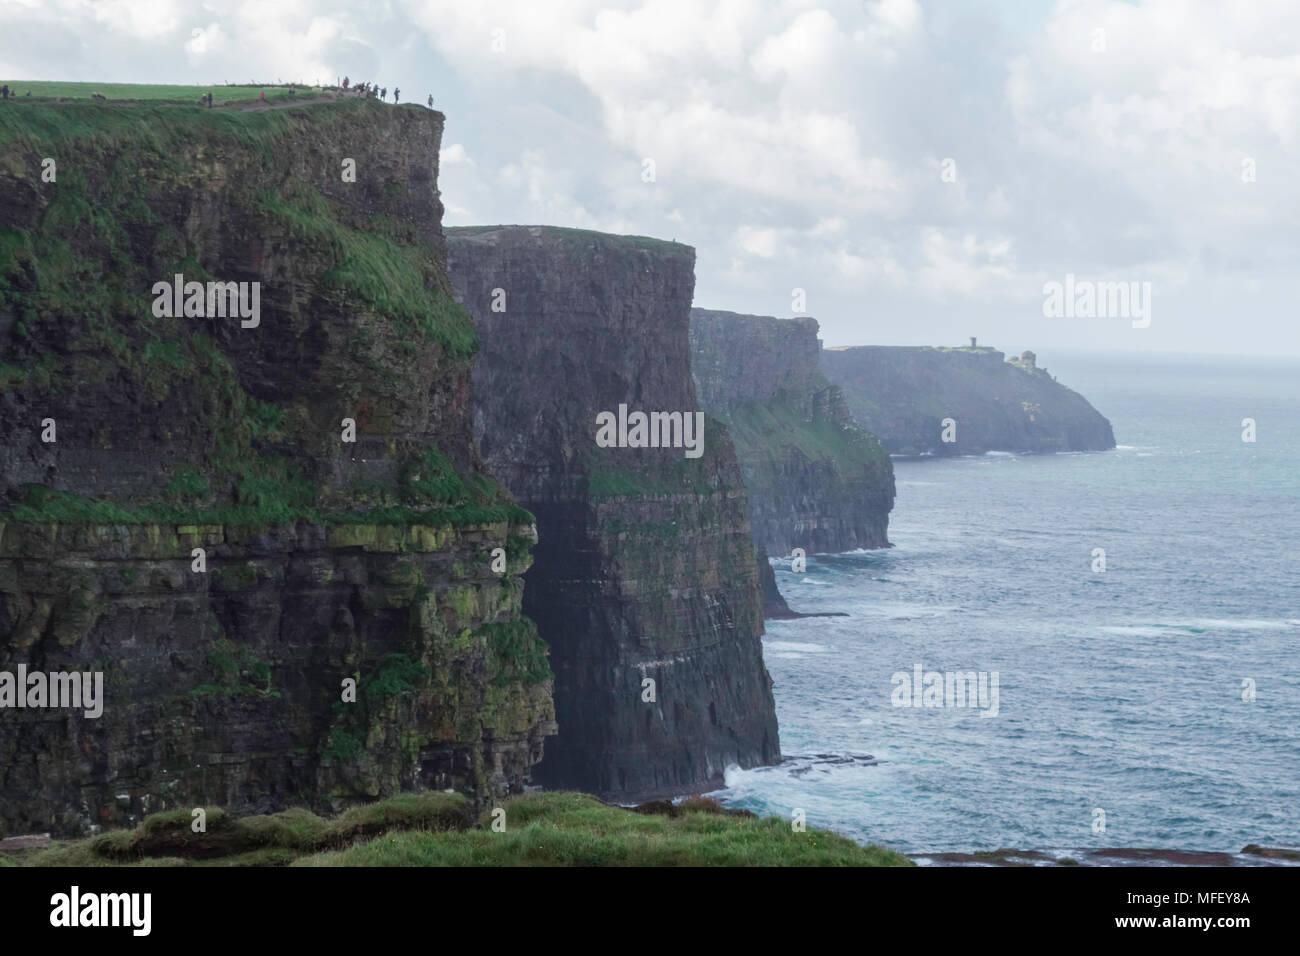 Cliffs of Moher, Ireland, Europe, Atlantic Ocean coastline - Stock Image